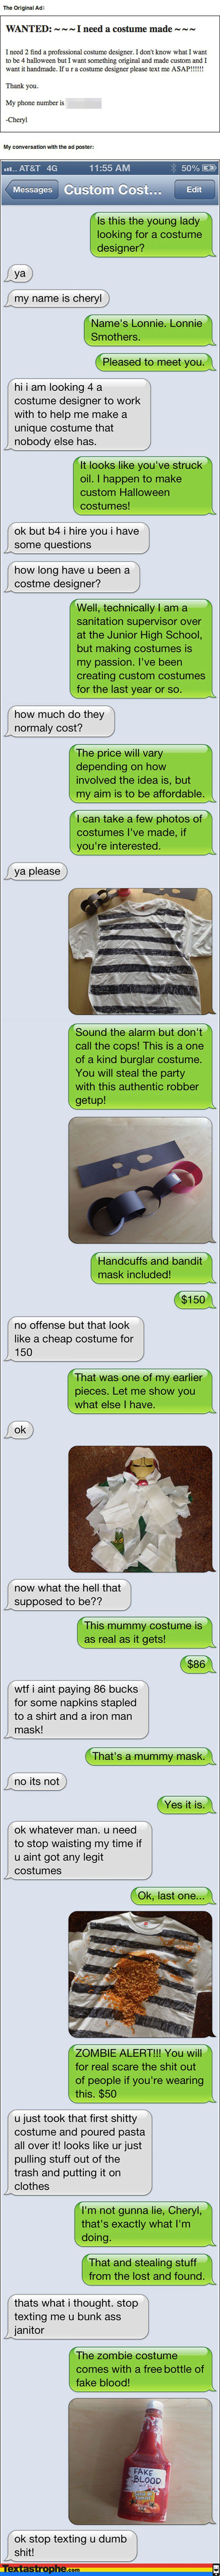 The Custom Costume